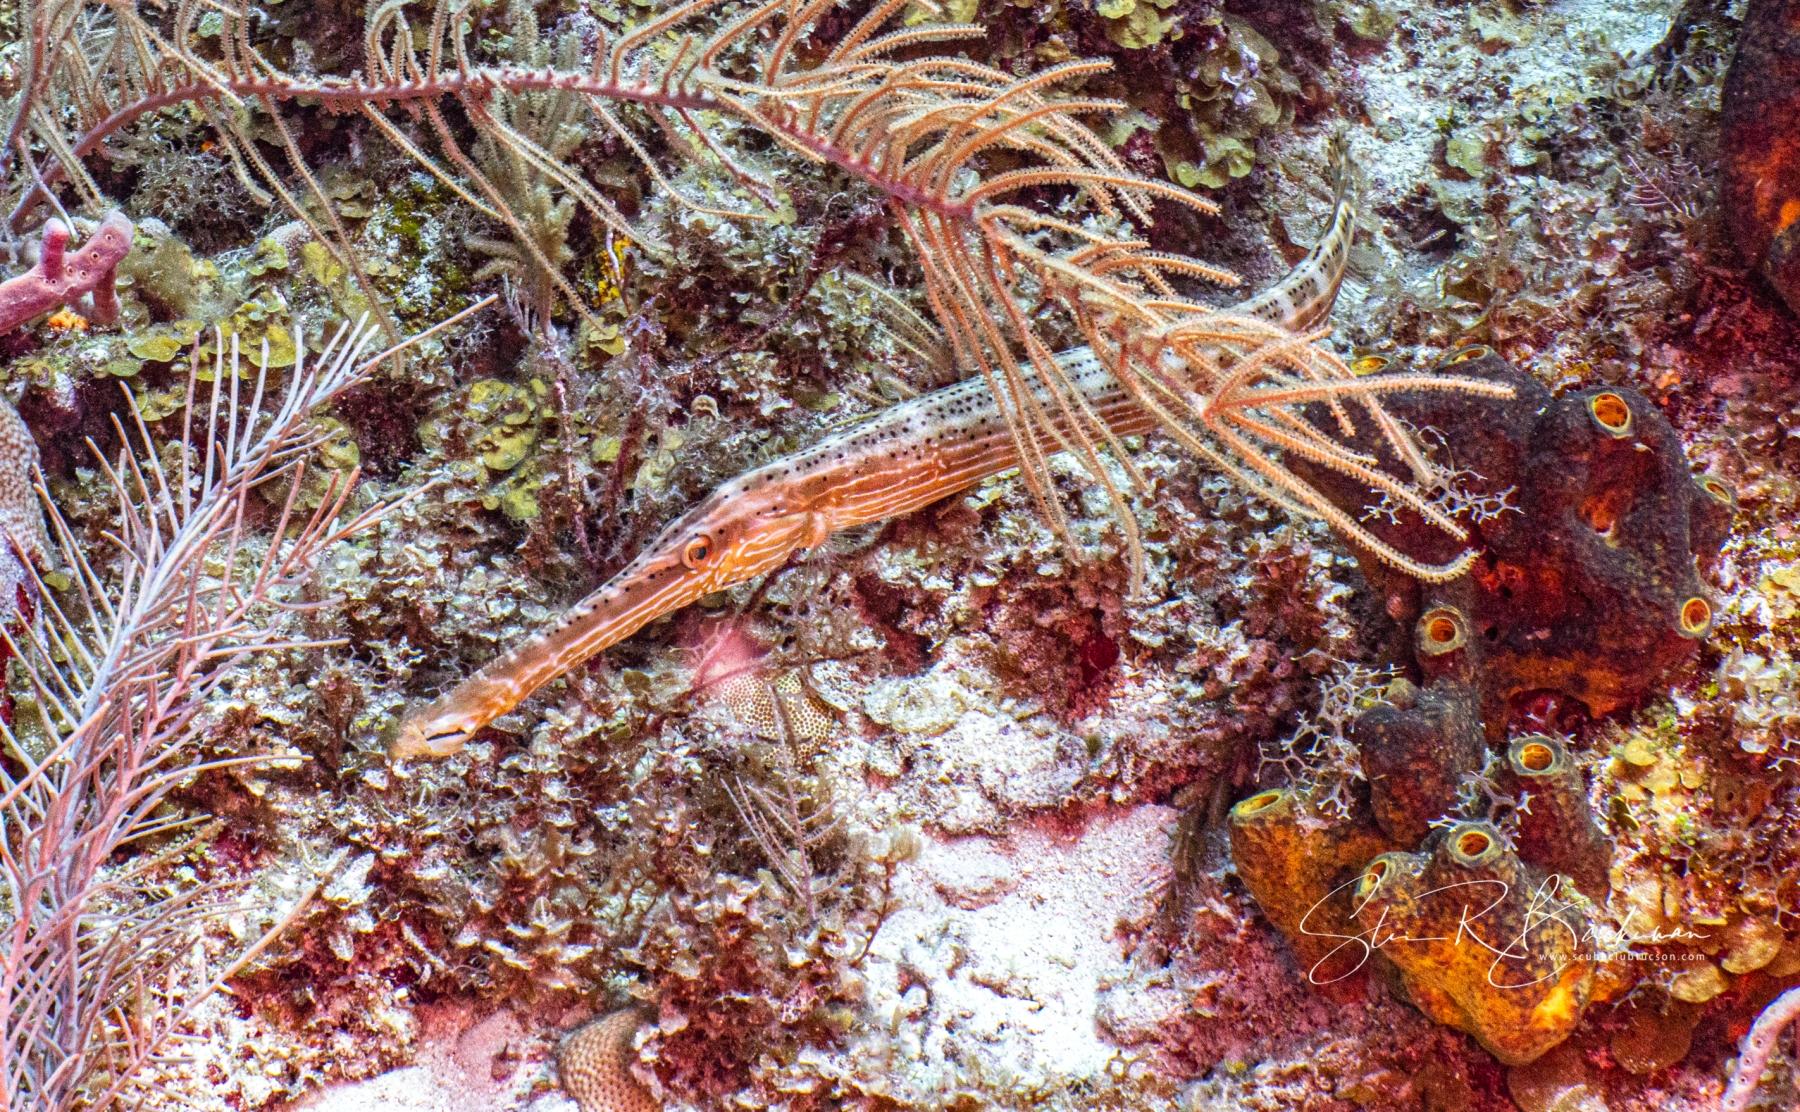 Atlantic-Trumpetfish-5457